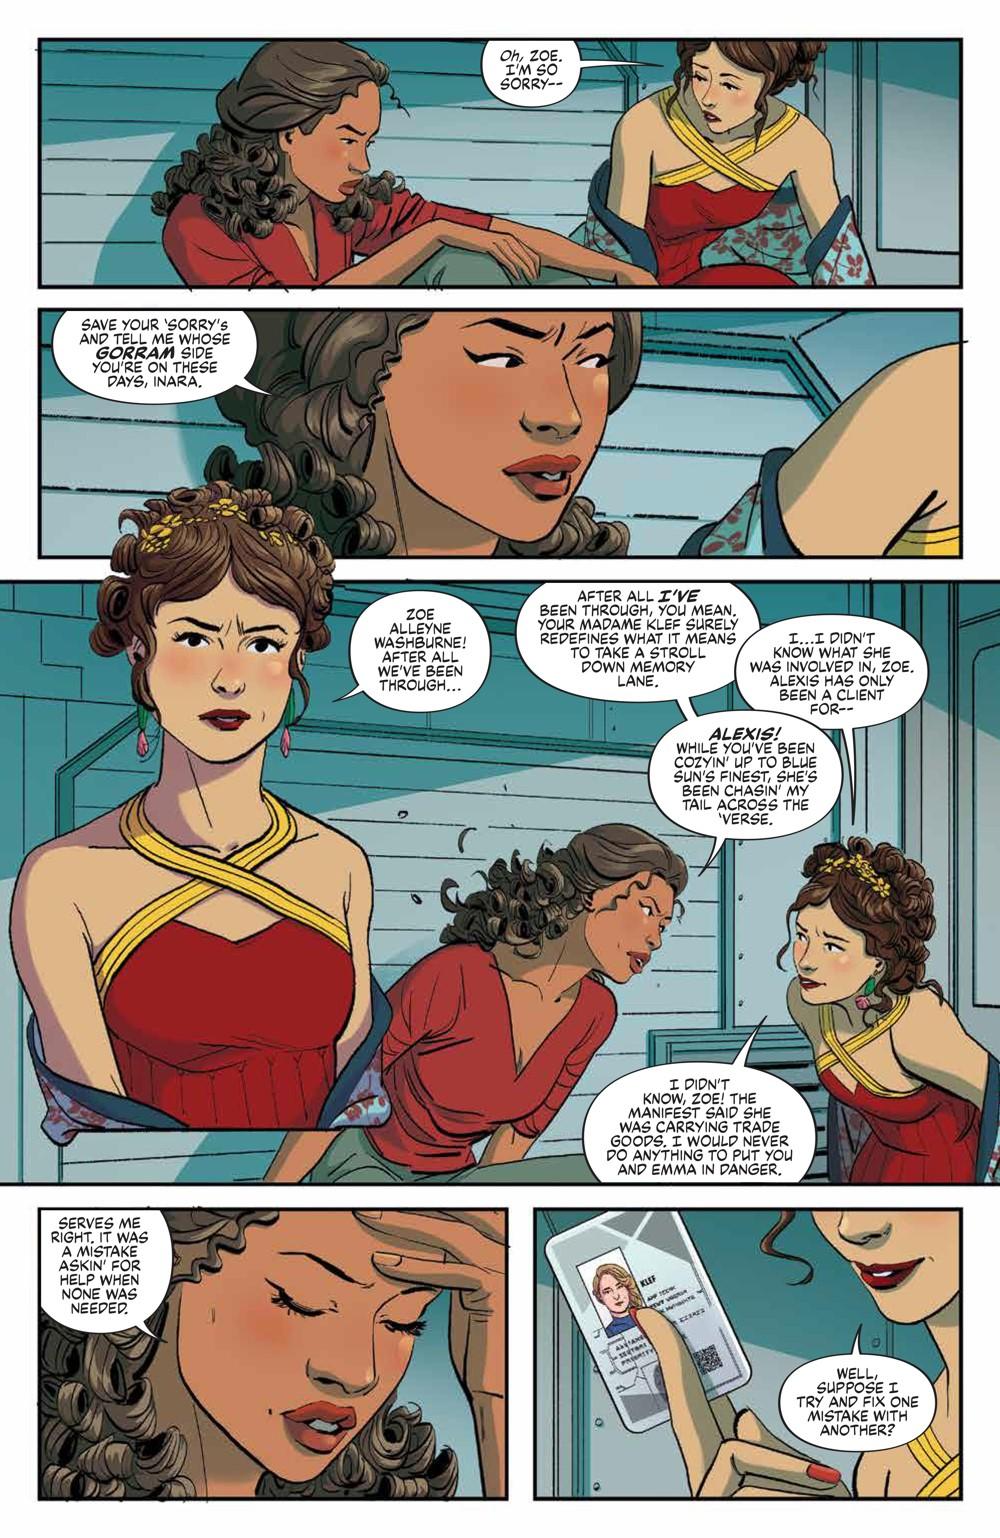 Firefly_BrandNewVerse_006_PRESS_8 ComicList Previews: FIREFLY BRAND NEW 'VERSE #6 (OF 6)